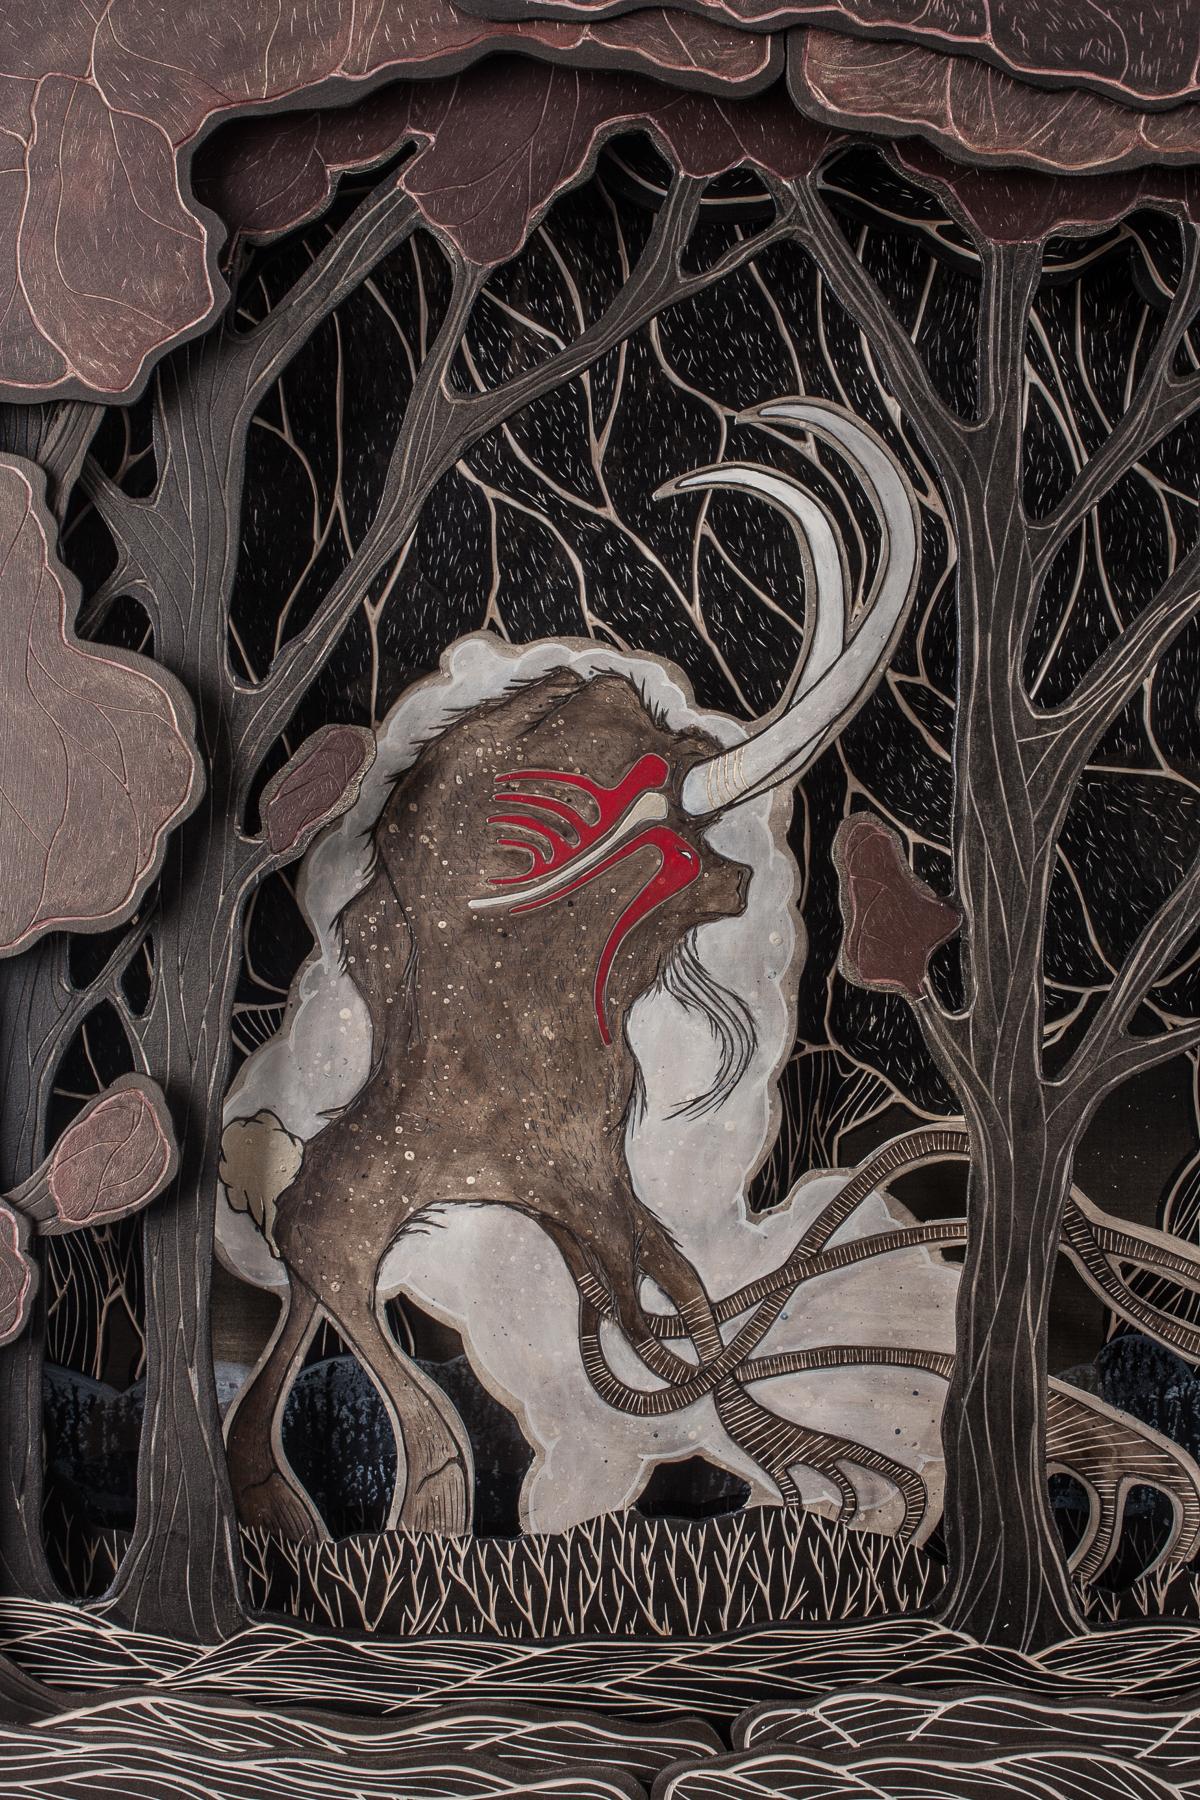 "Detail from:Encounter at 4 am (2015), Multi-layered woodcut, acrylic paint, ca. 150 x 125 x 13 cm (59"" x 49"" x 12.5"") | © Alex Diamond"